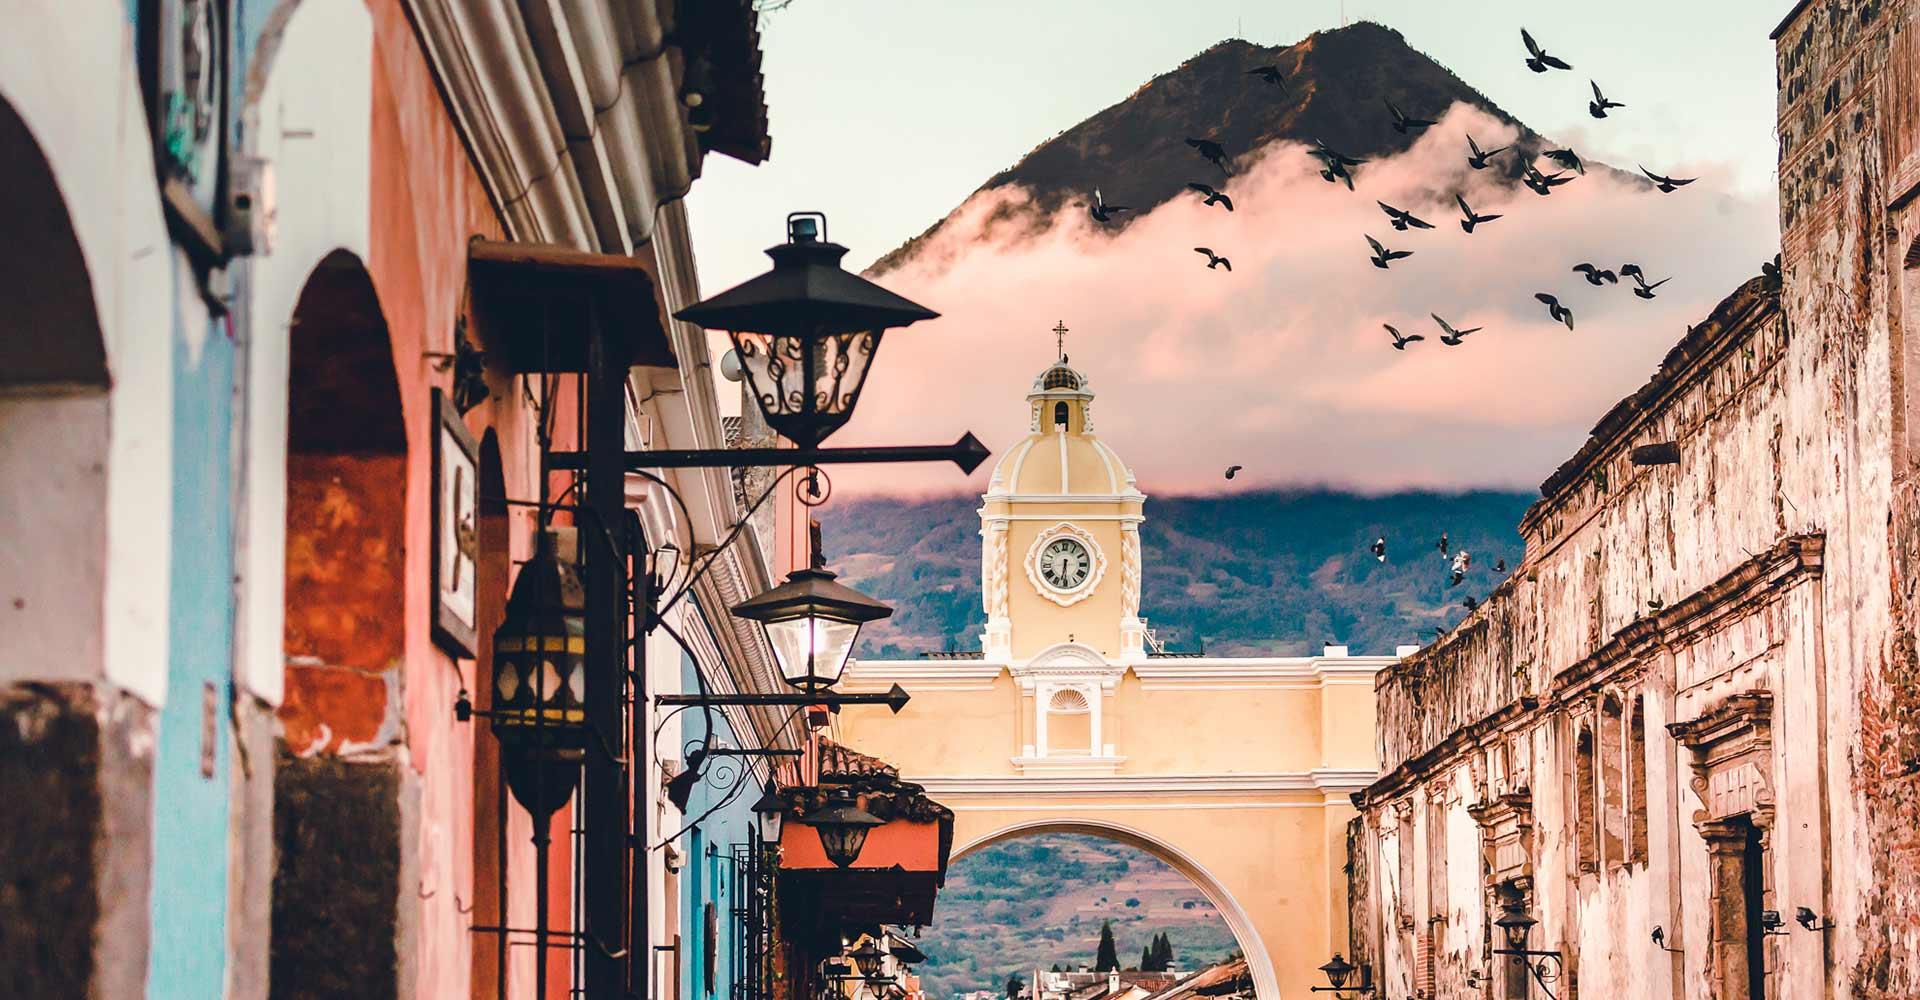 Banner image of Guatemala